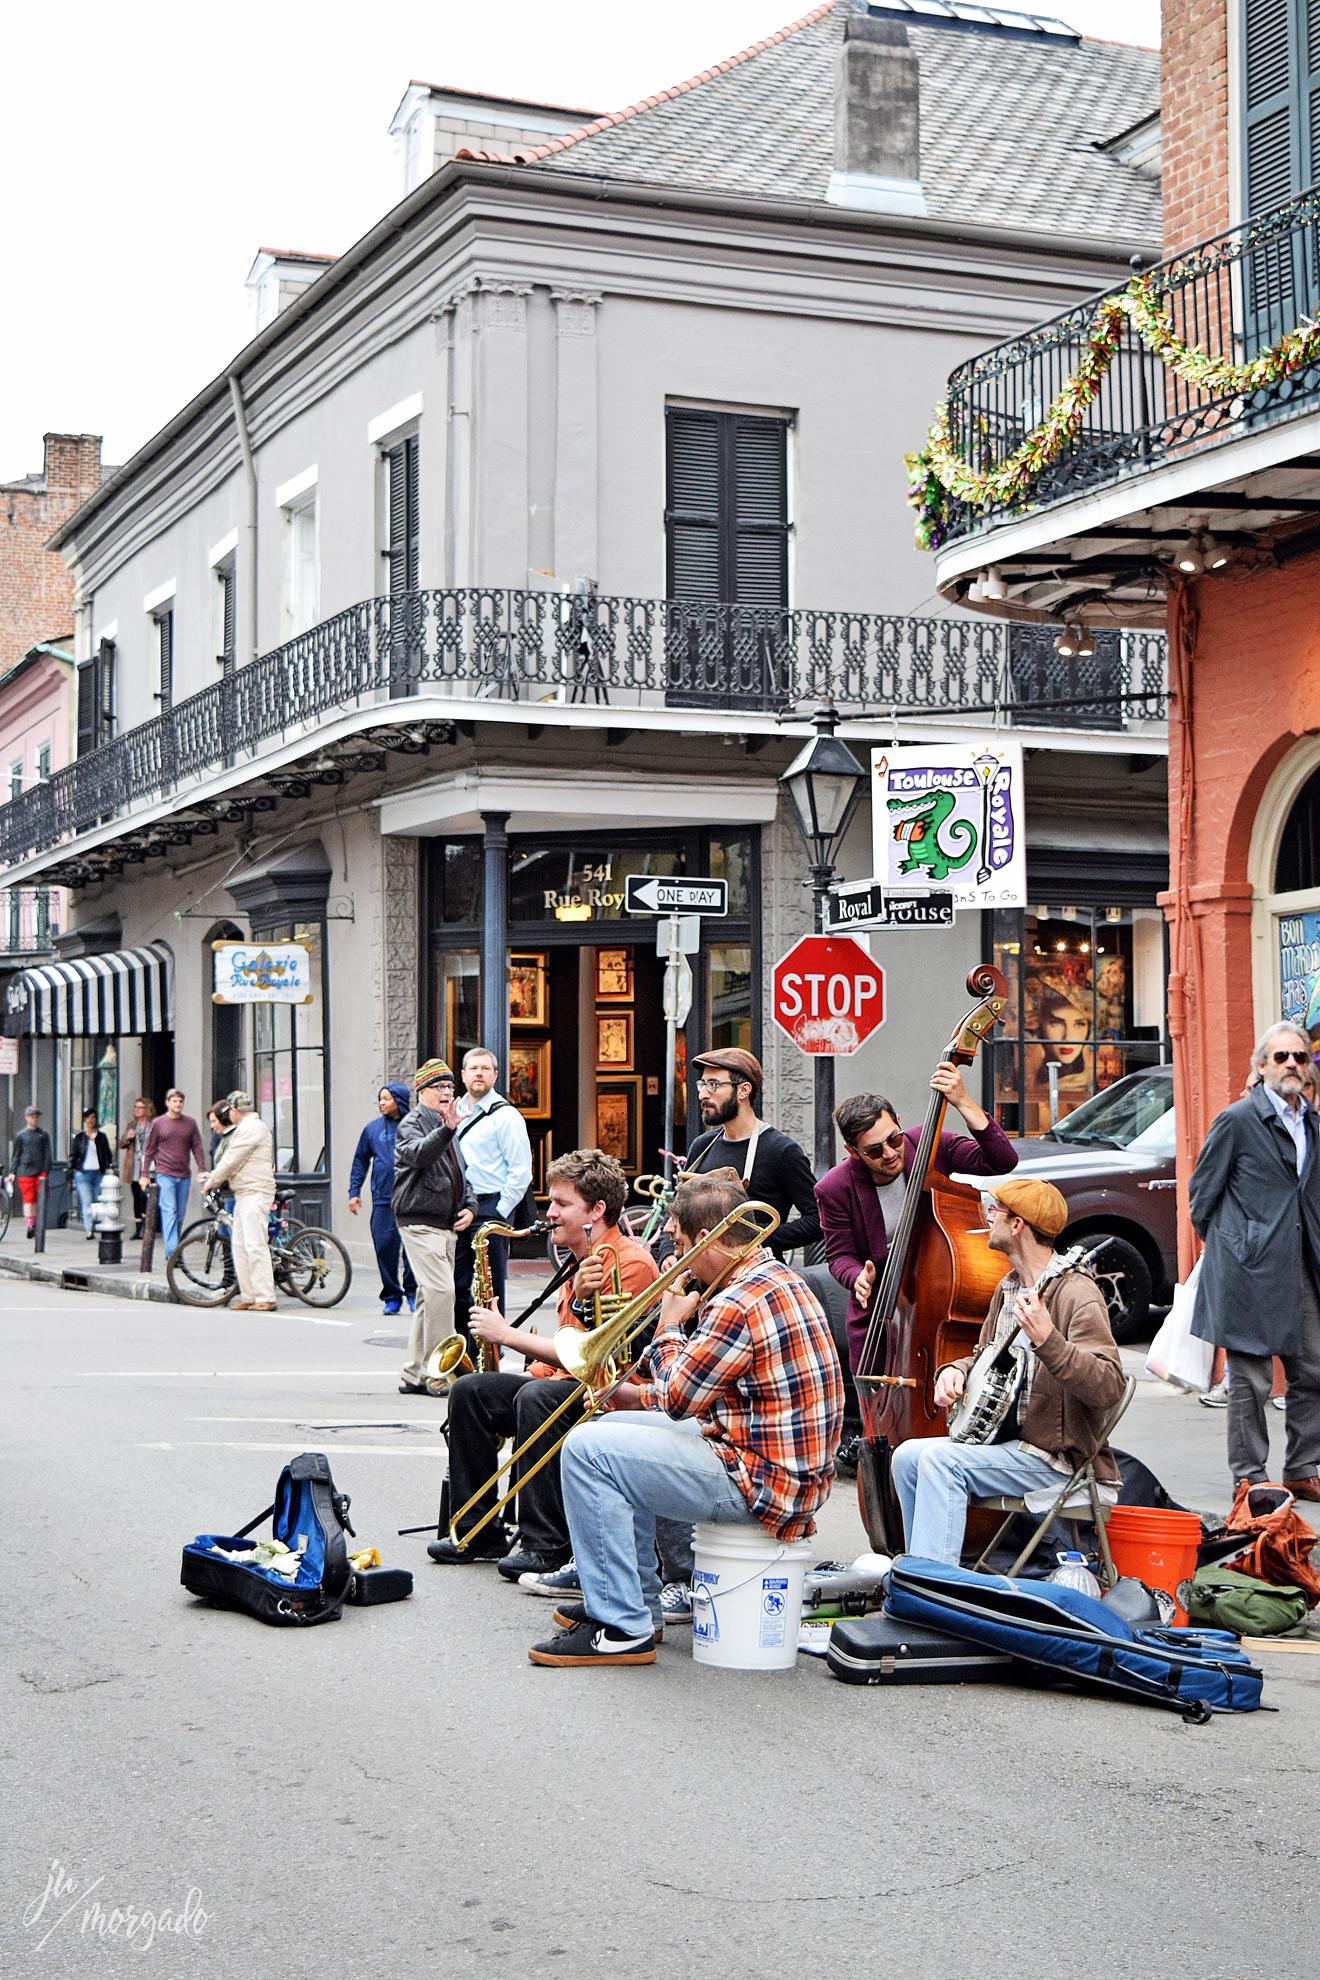 Banda tocando na rua de New Orleans.